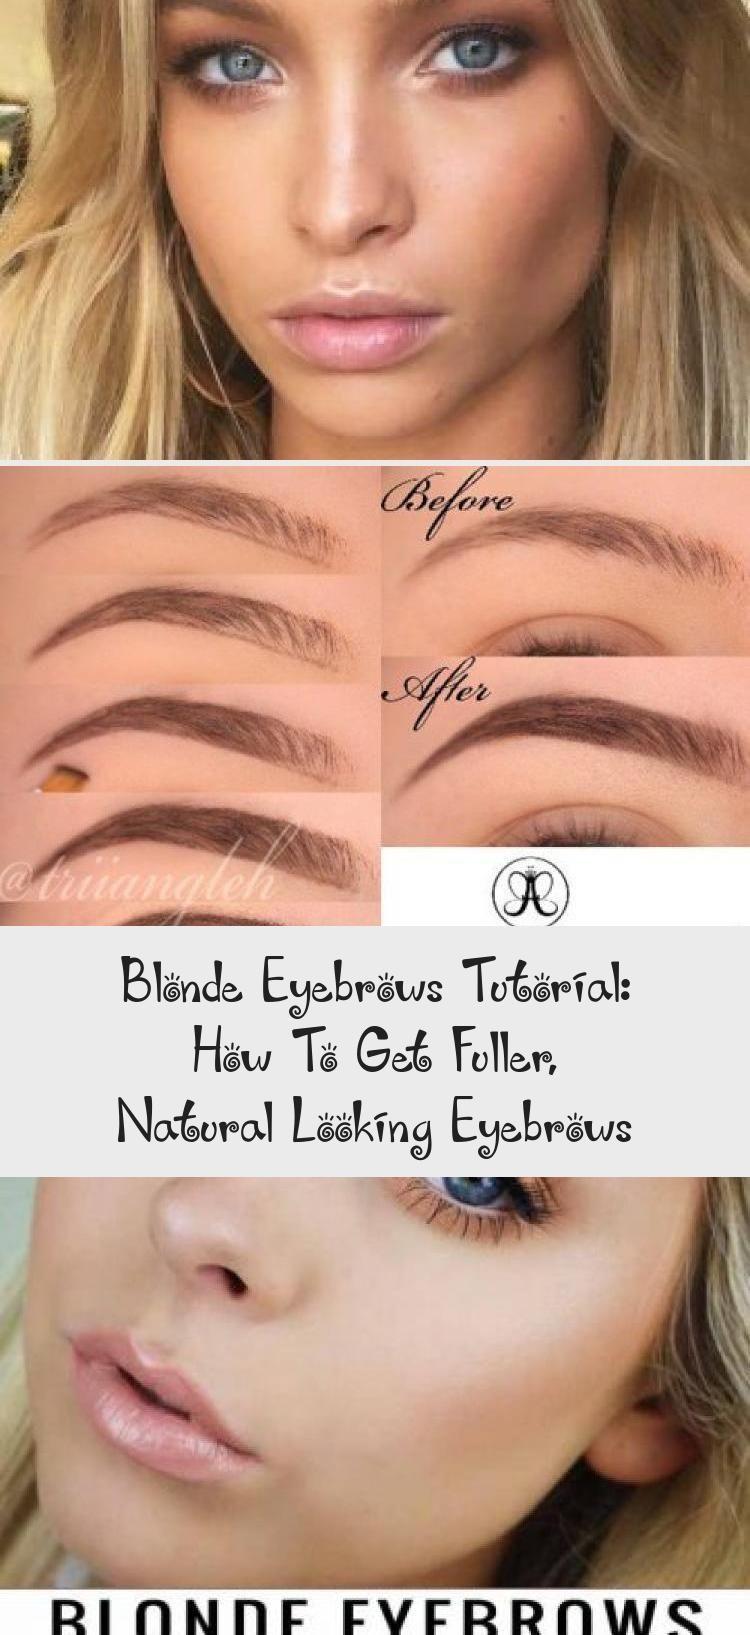 Blonde Eyebrows Tutorial How To Get Fuller Natural Looking Eyebrows Eyebrowst In 2020 Blonde Eyebrows Eyebrow Tutorial Eyebrows